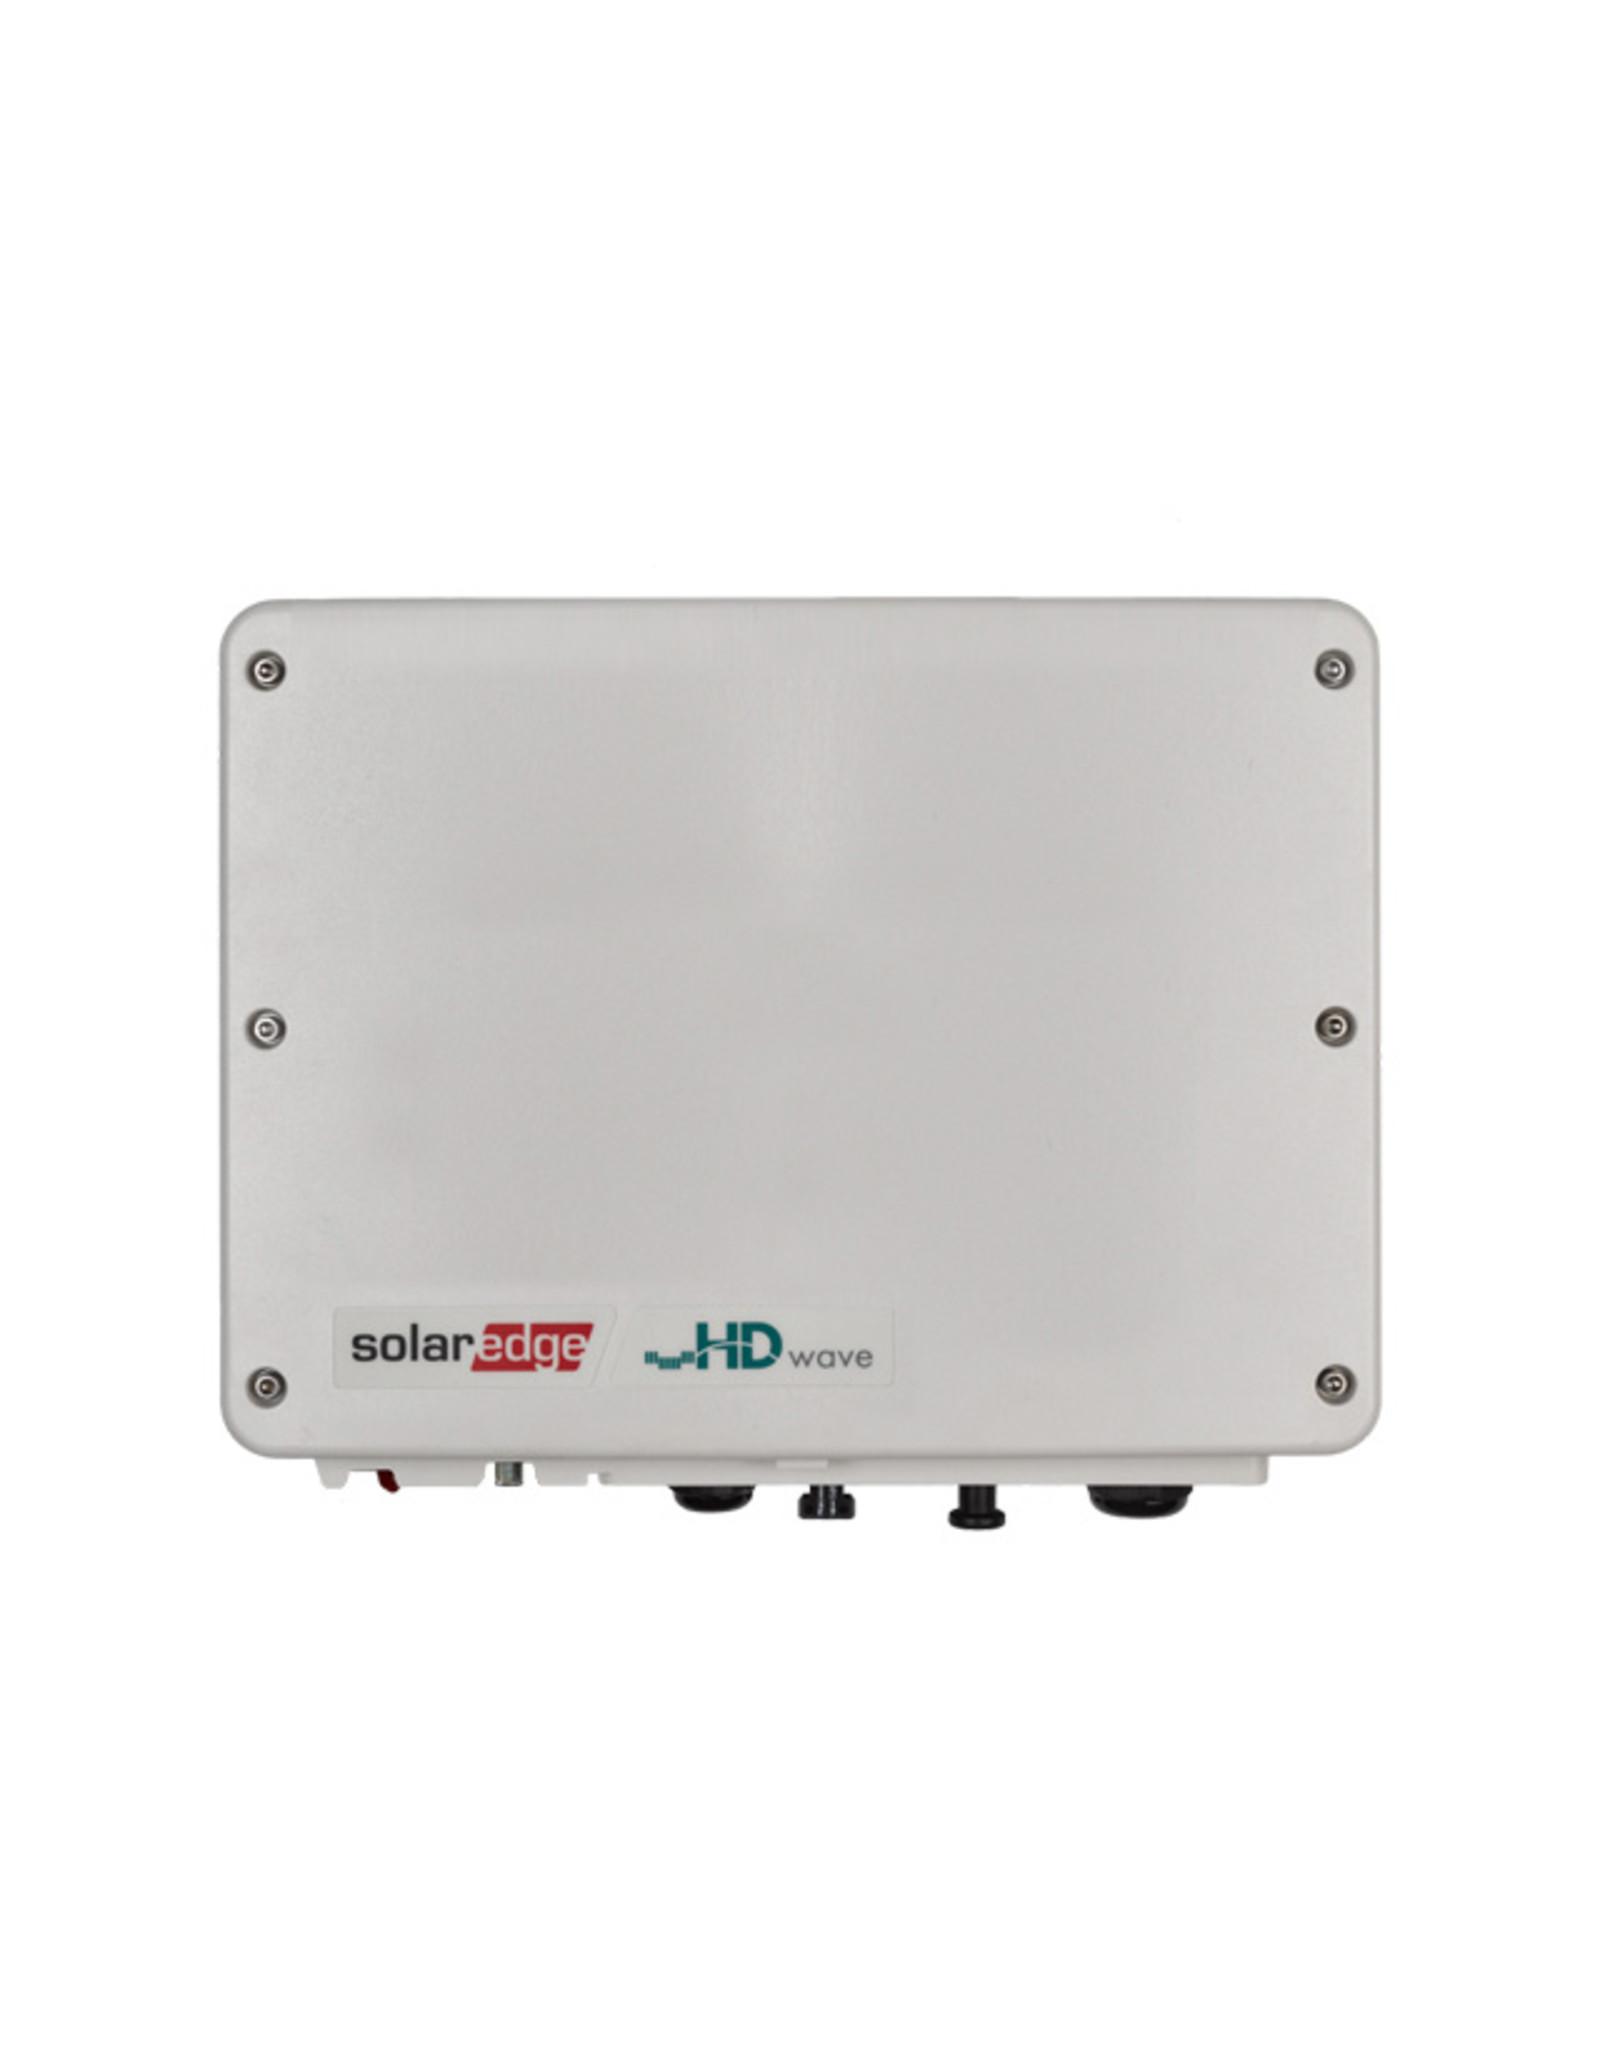 SolarEdge SolarEdge SE3000H enkelfase omvormer 3.0 kW HD-Wave - met SetApp configuratie